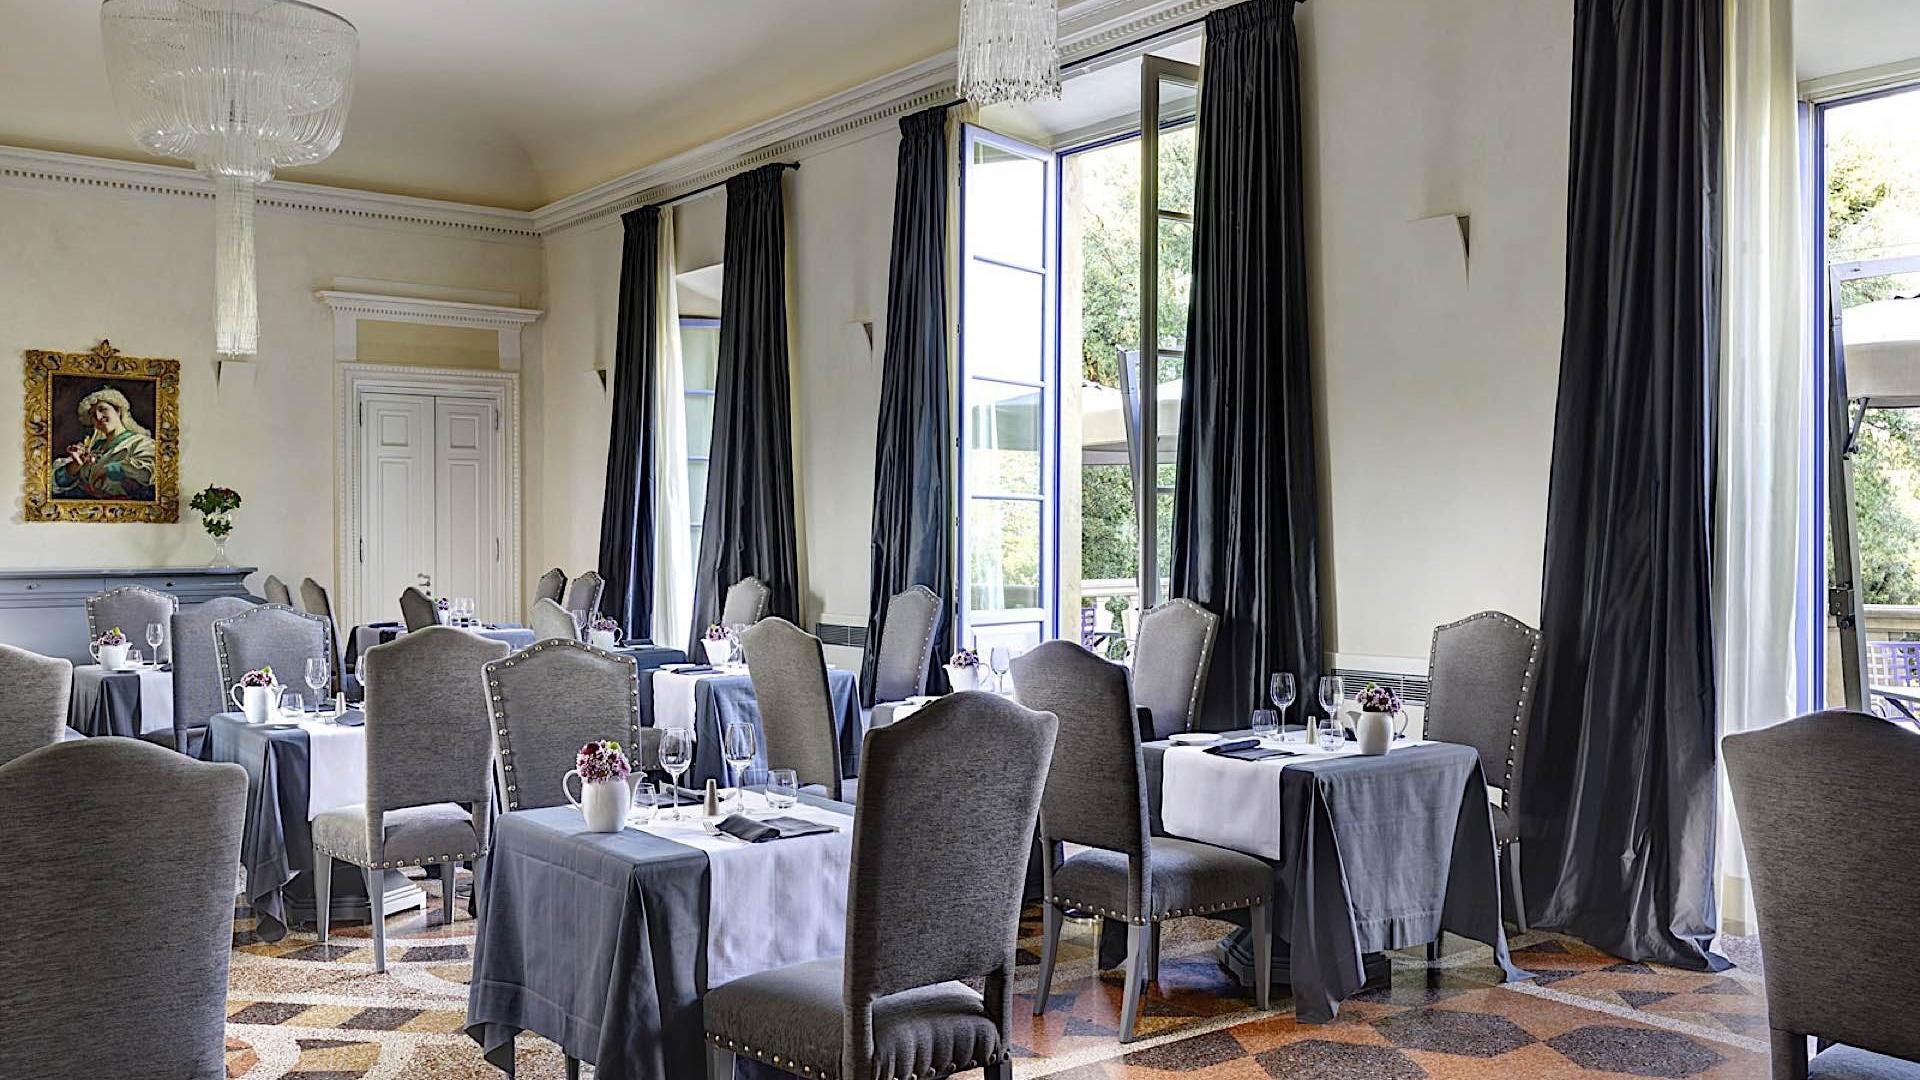 Restaurant Piopponero | Villa Le Maschere